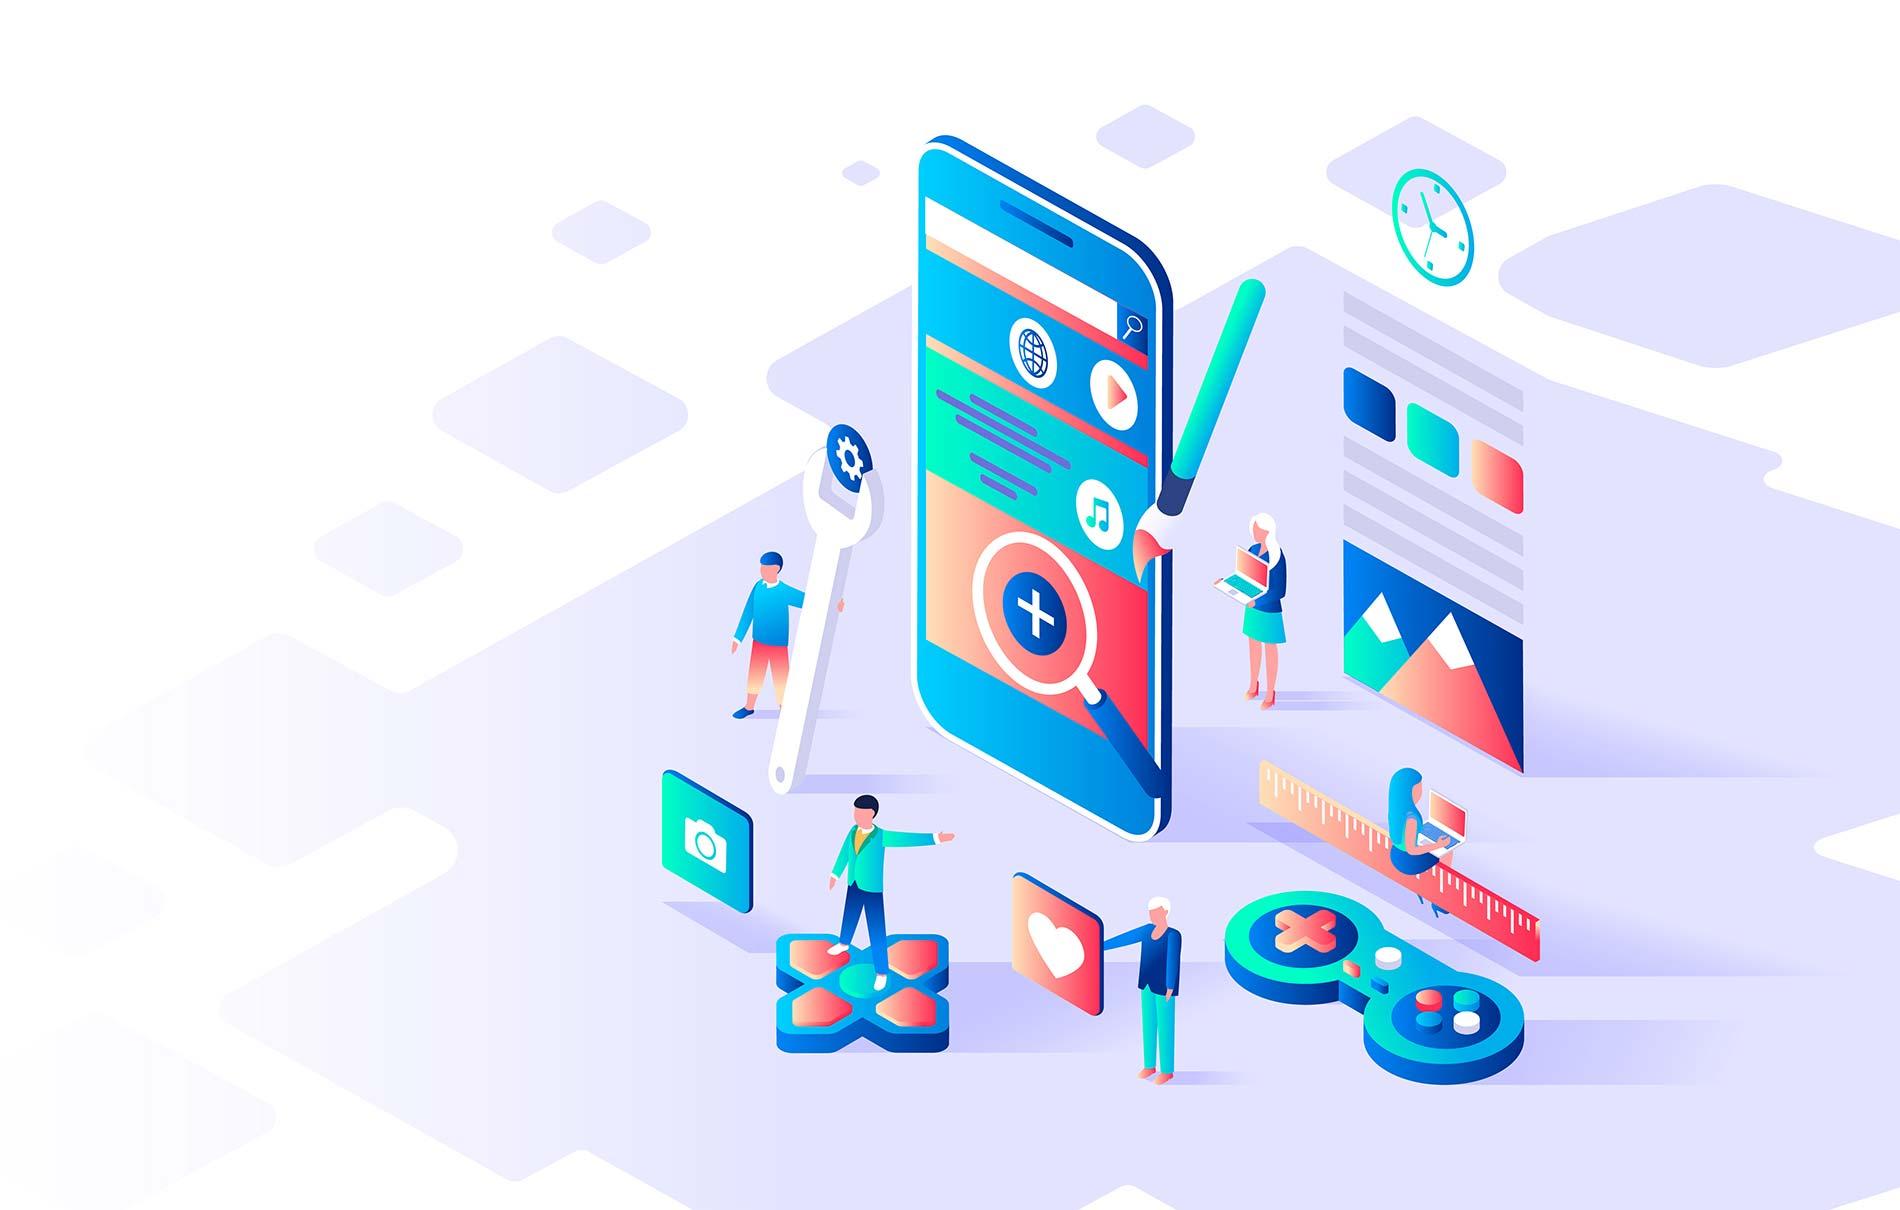 Is Mobile Application Development Still Profitable?